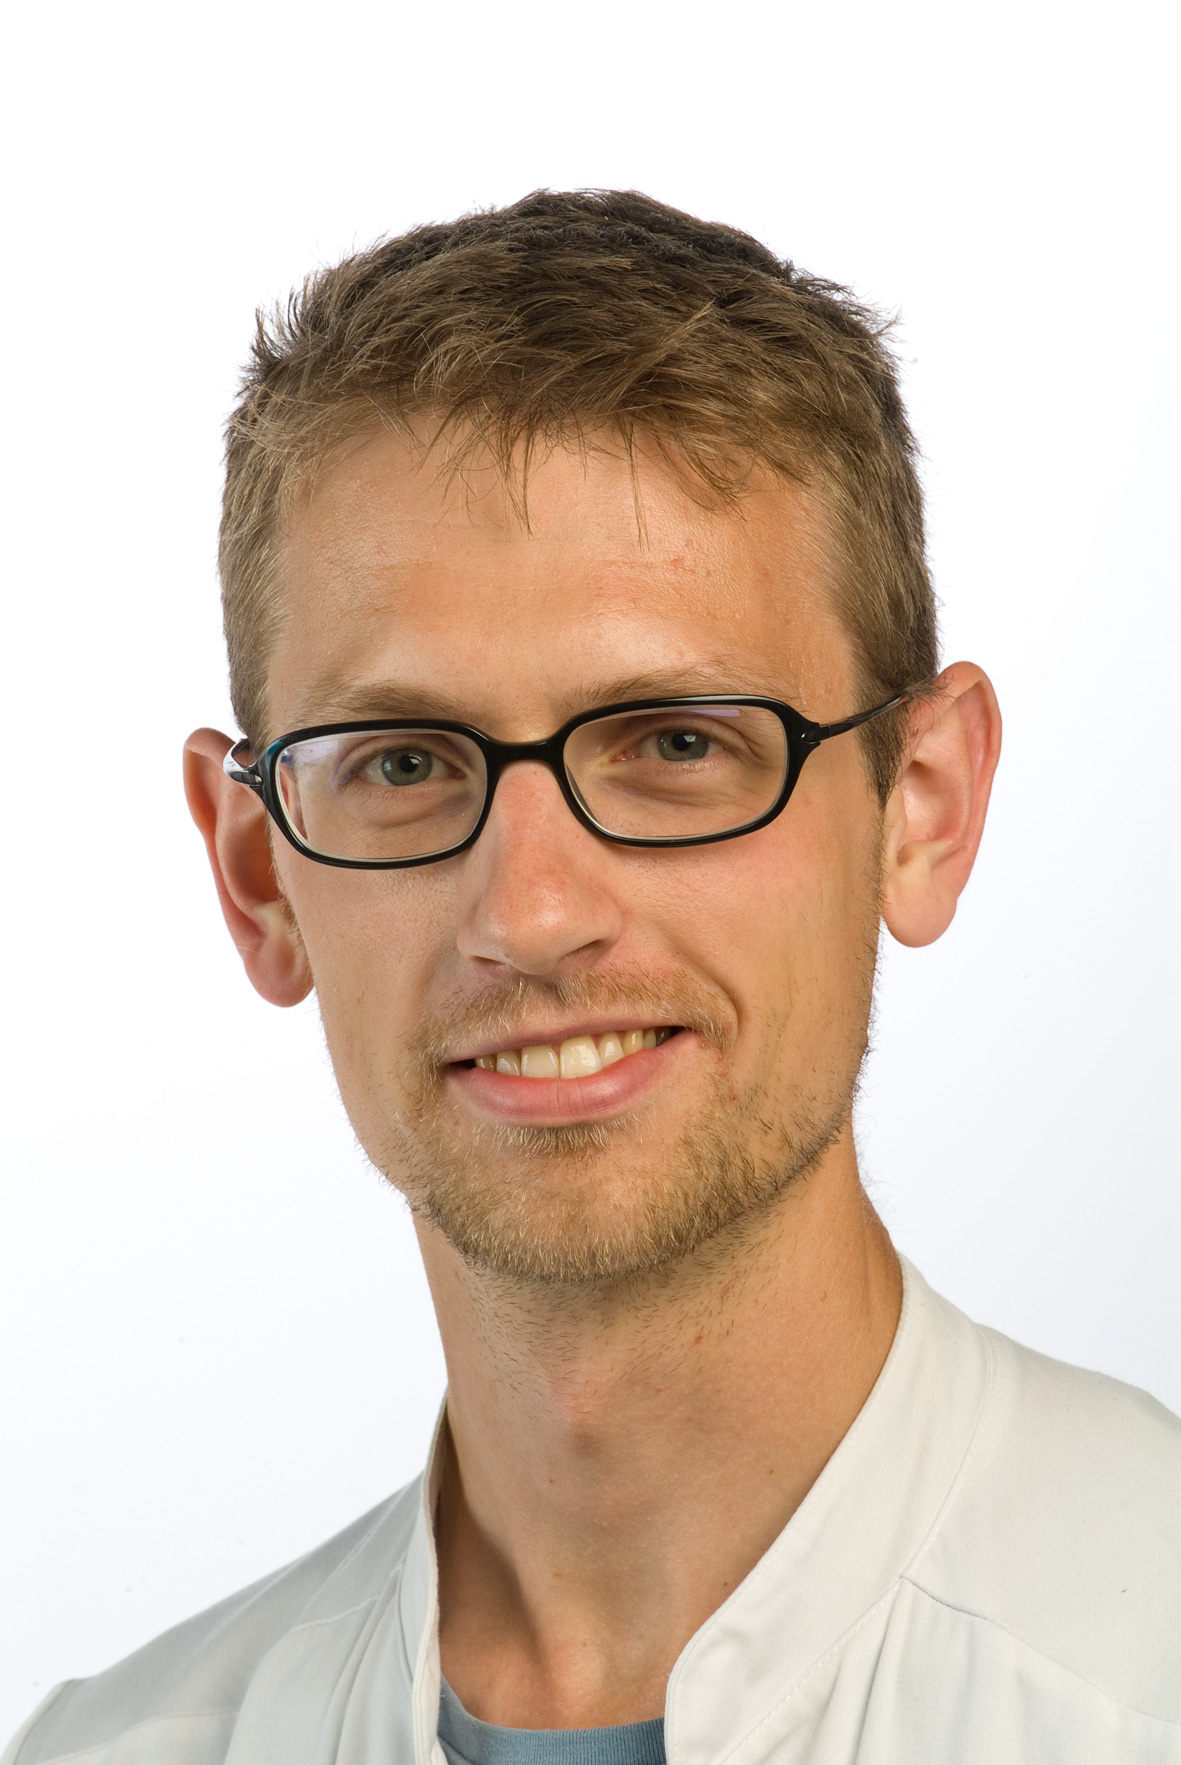 Erik L. Johnsen